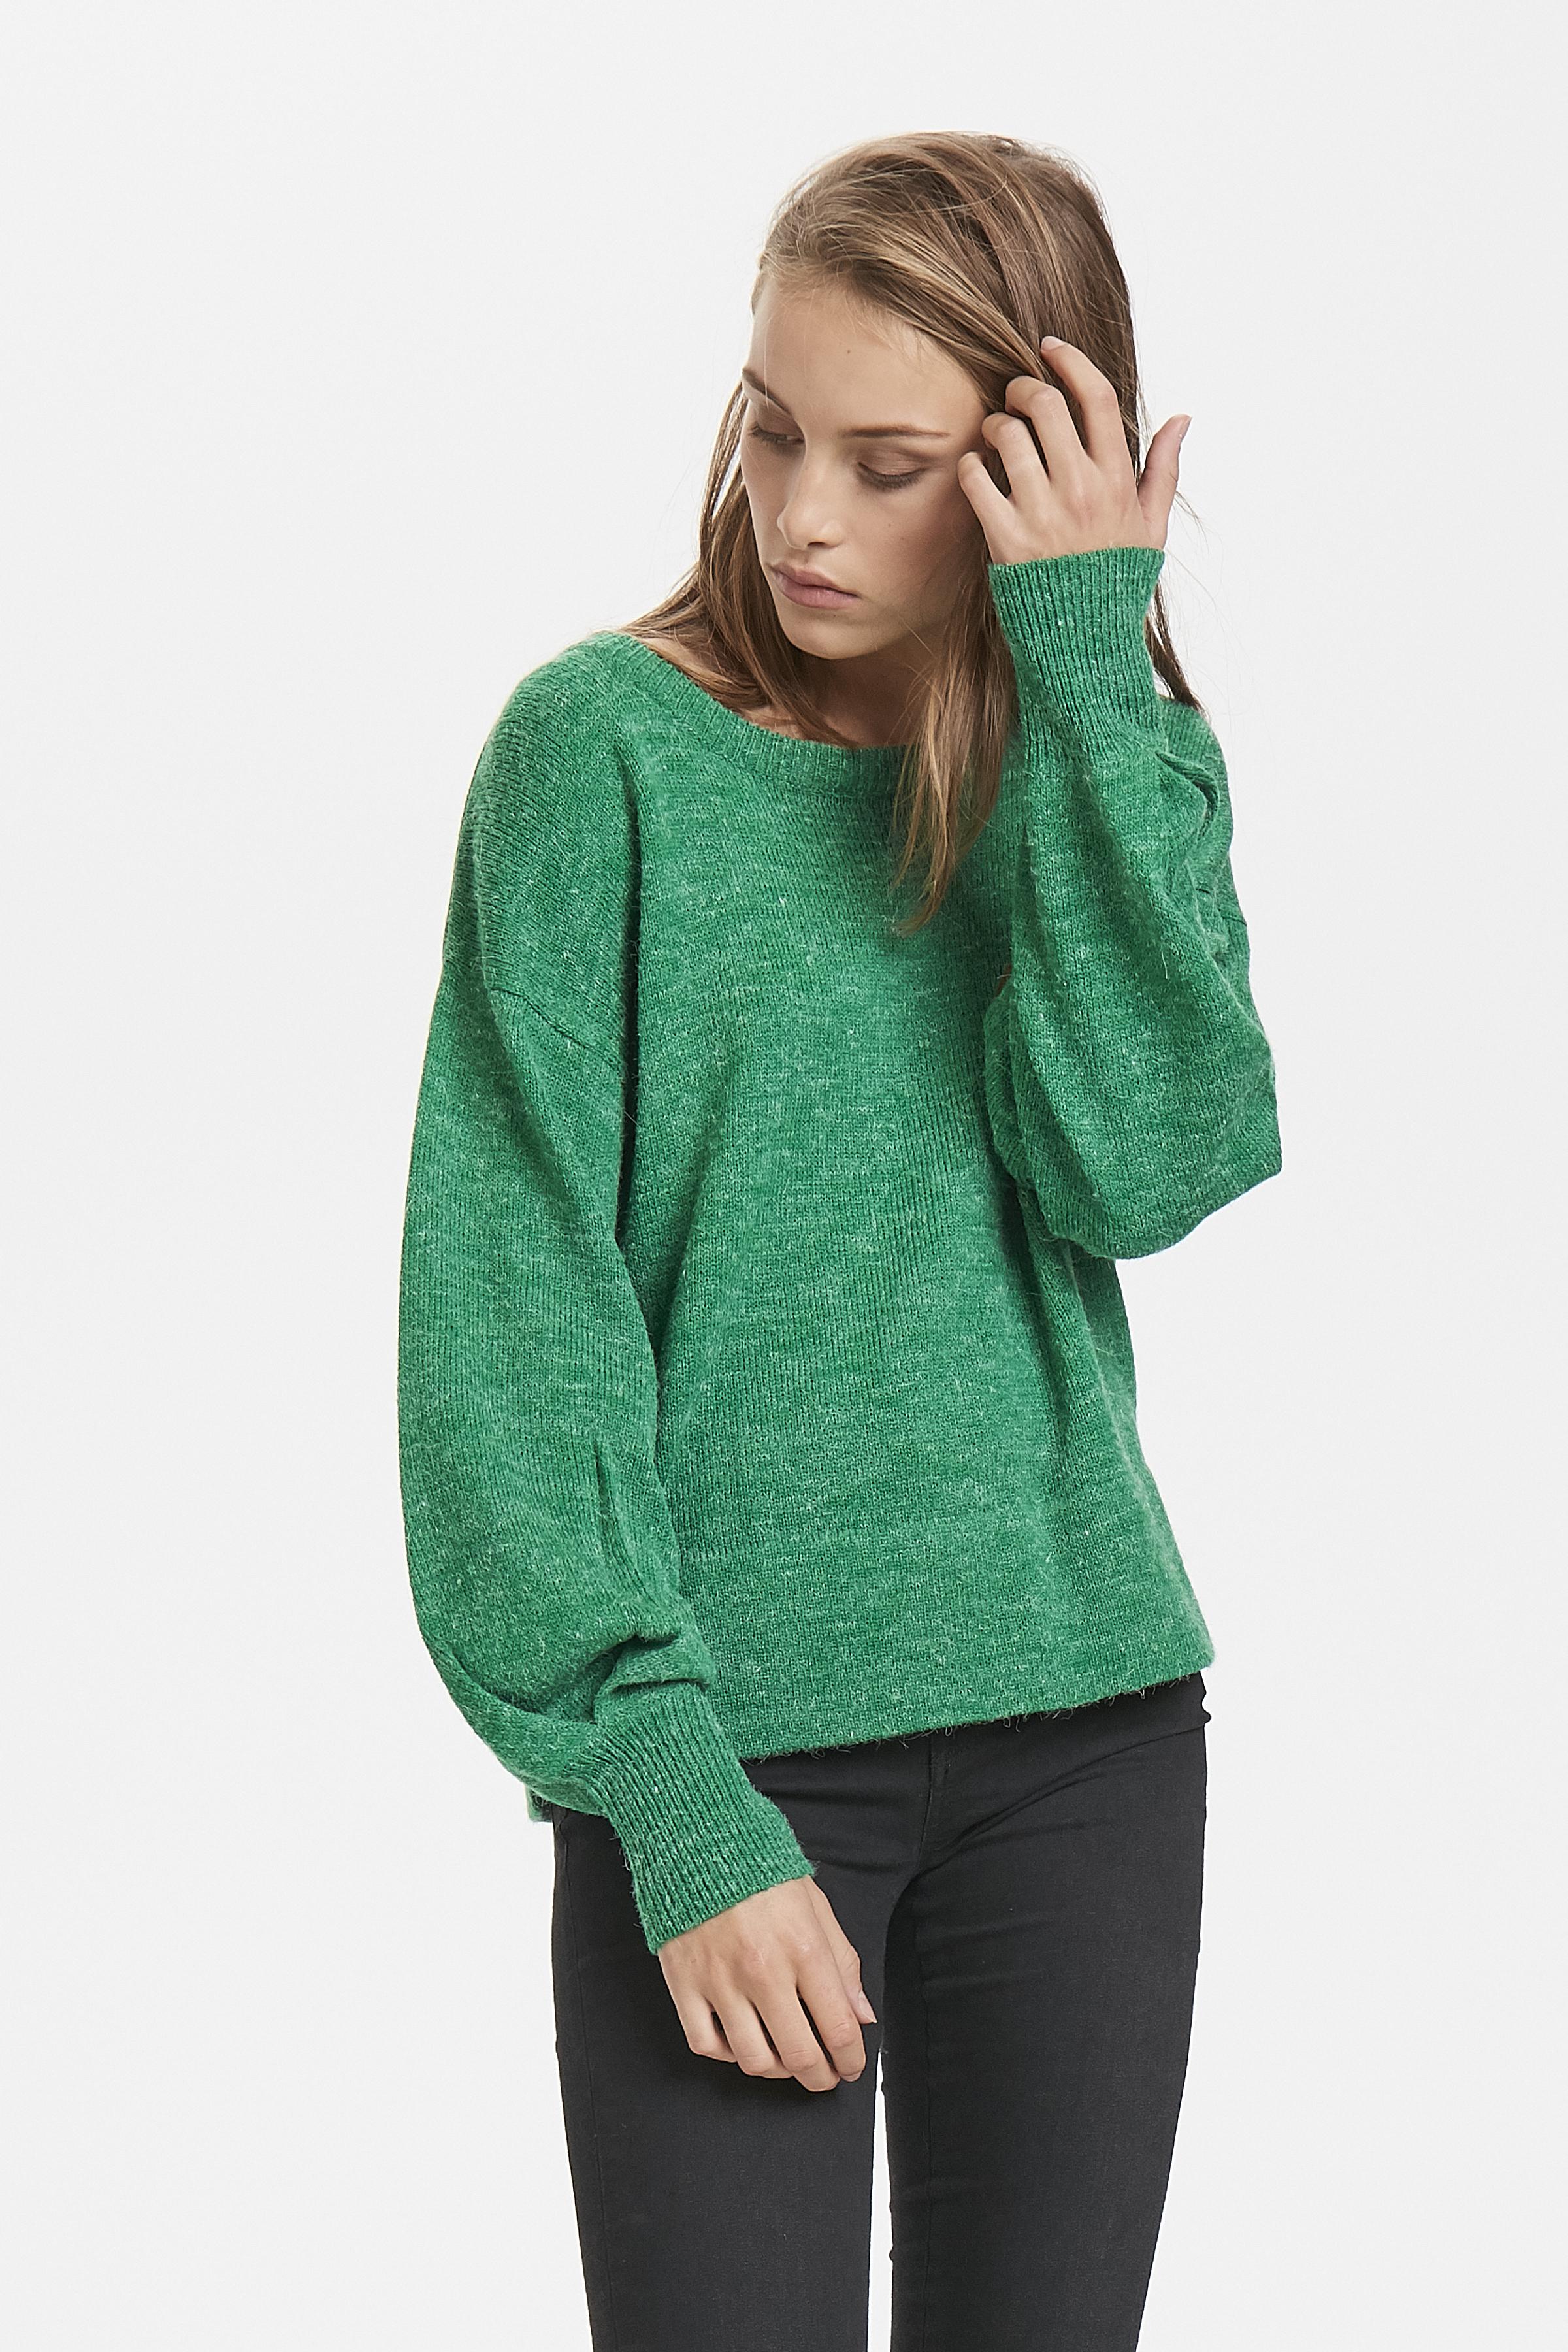 Jolly Green Strikpullover – Køb Jolly Green Strikpullover fra str. XS-XL her